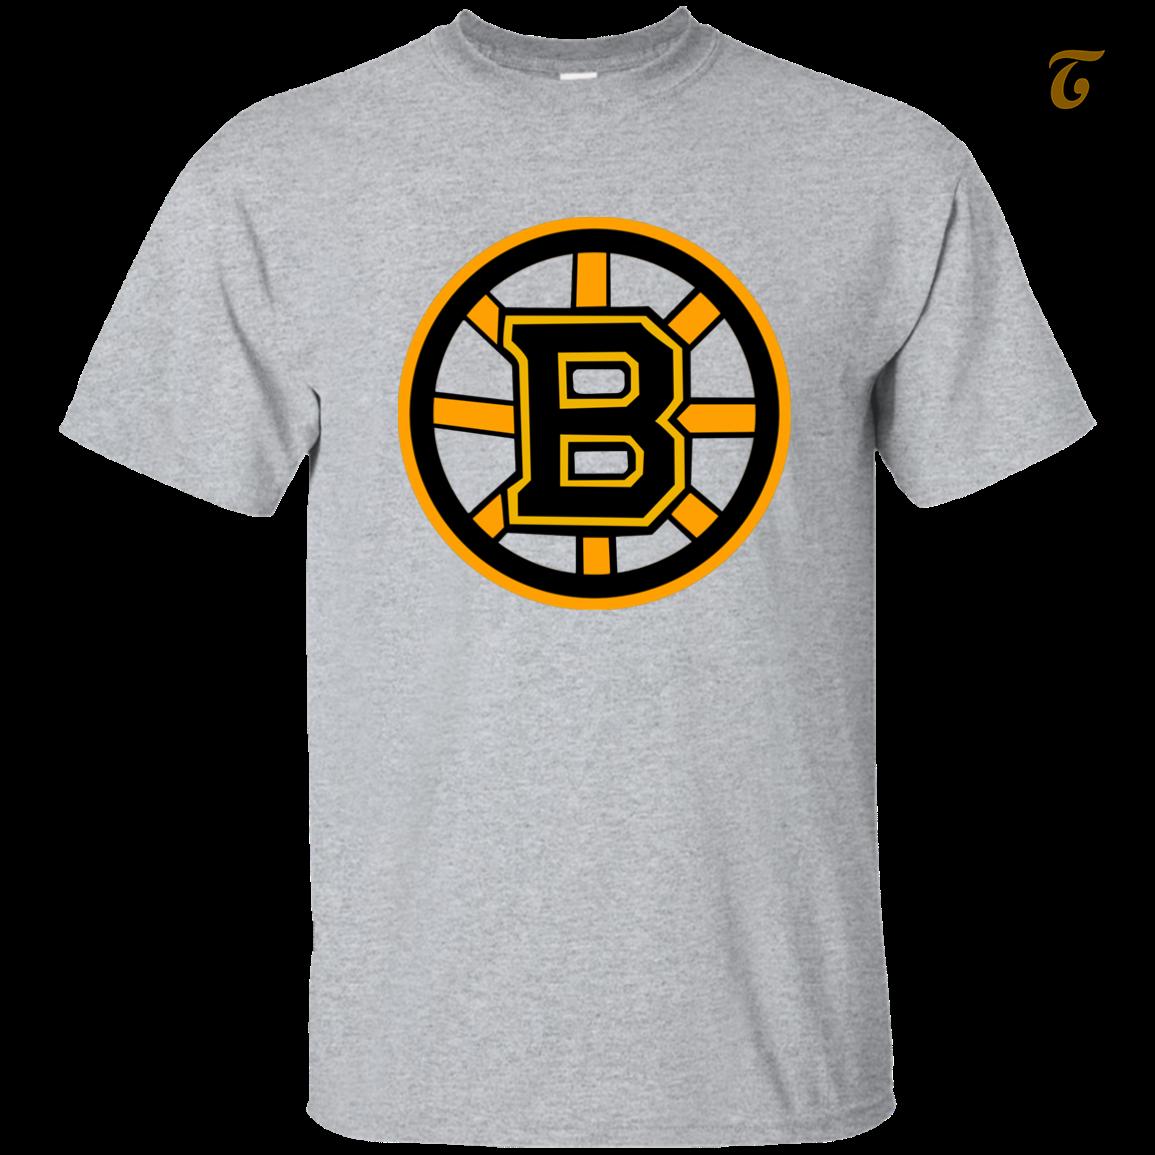 Boston, Burins, Hockey, Team, Men's T shirt - Sport Grey